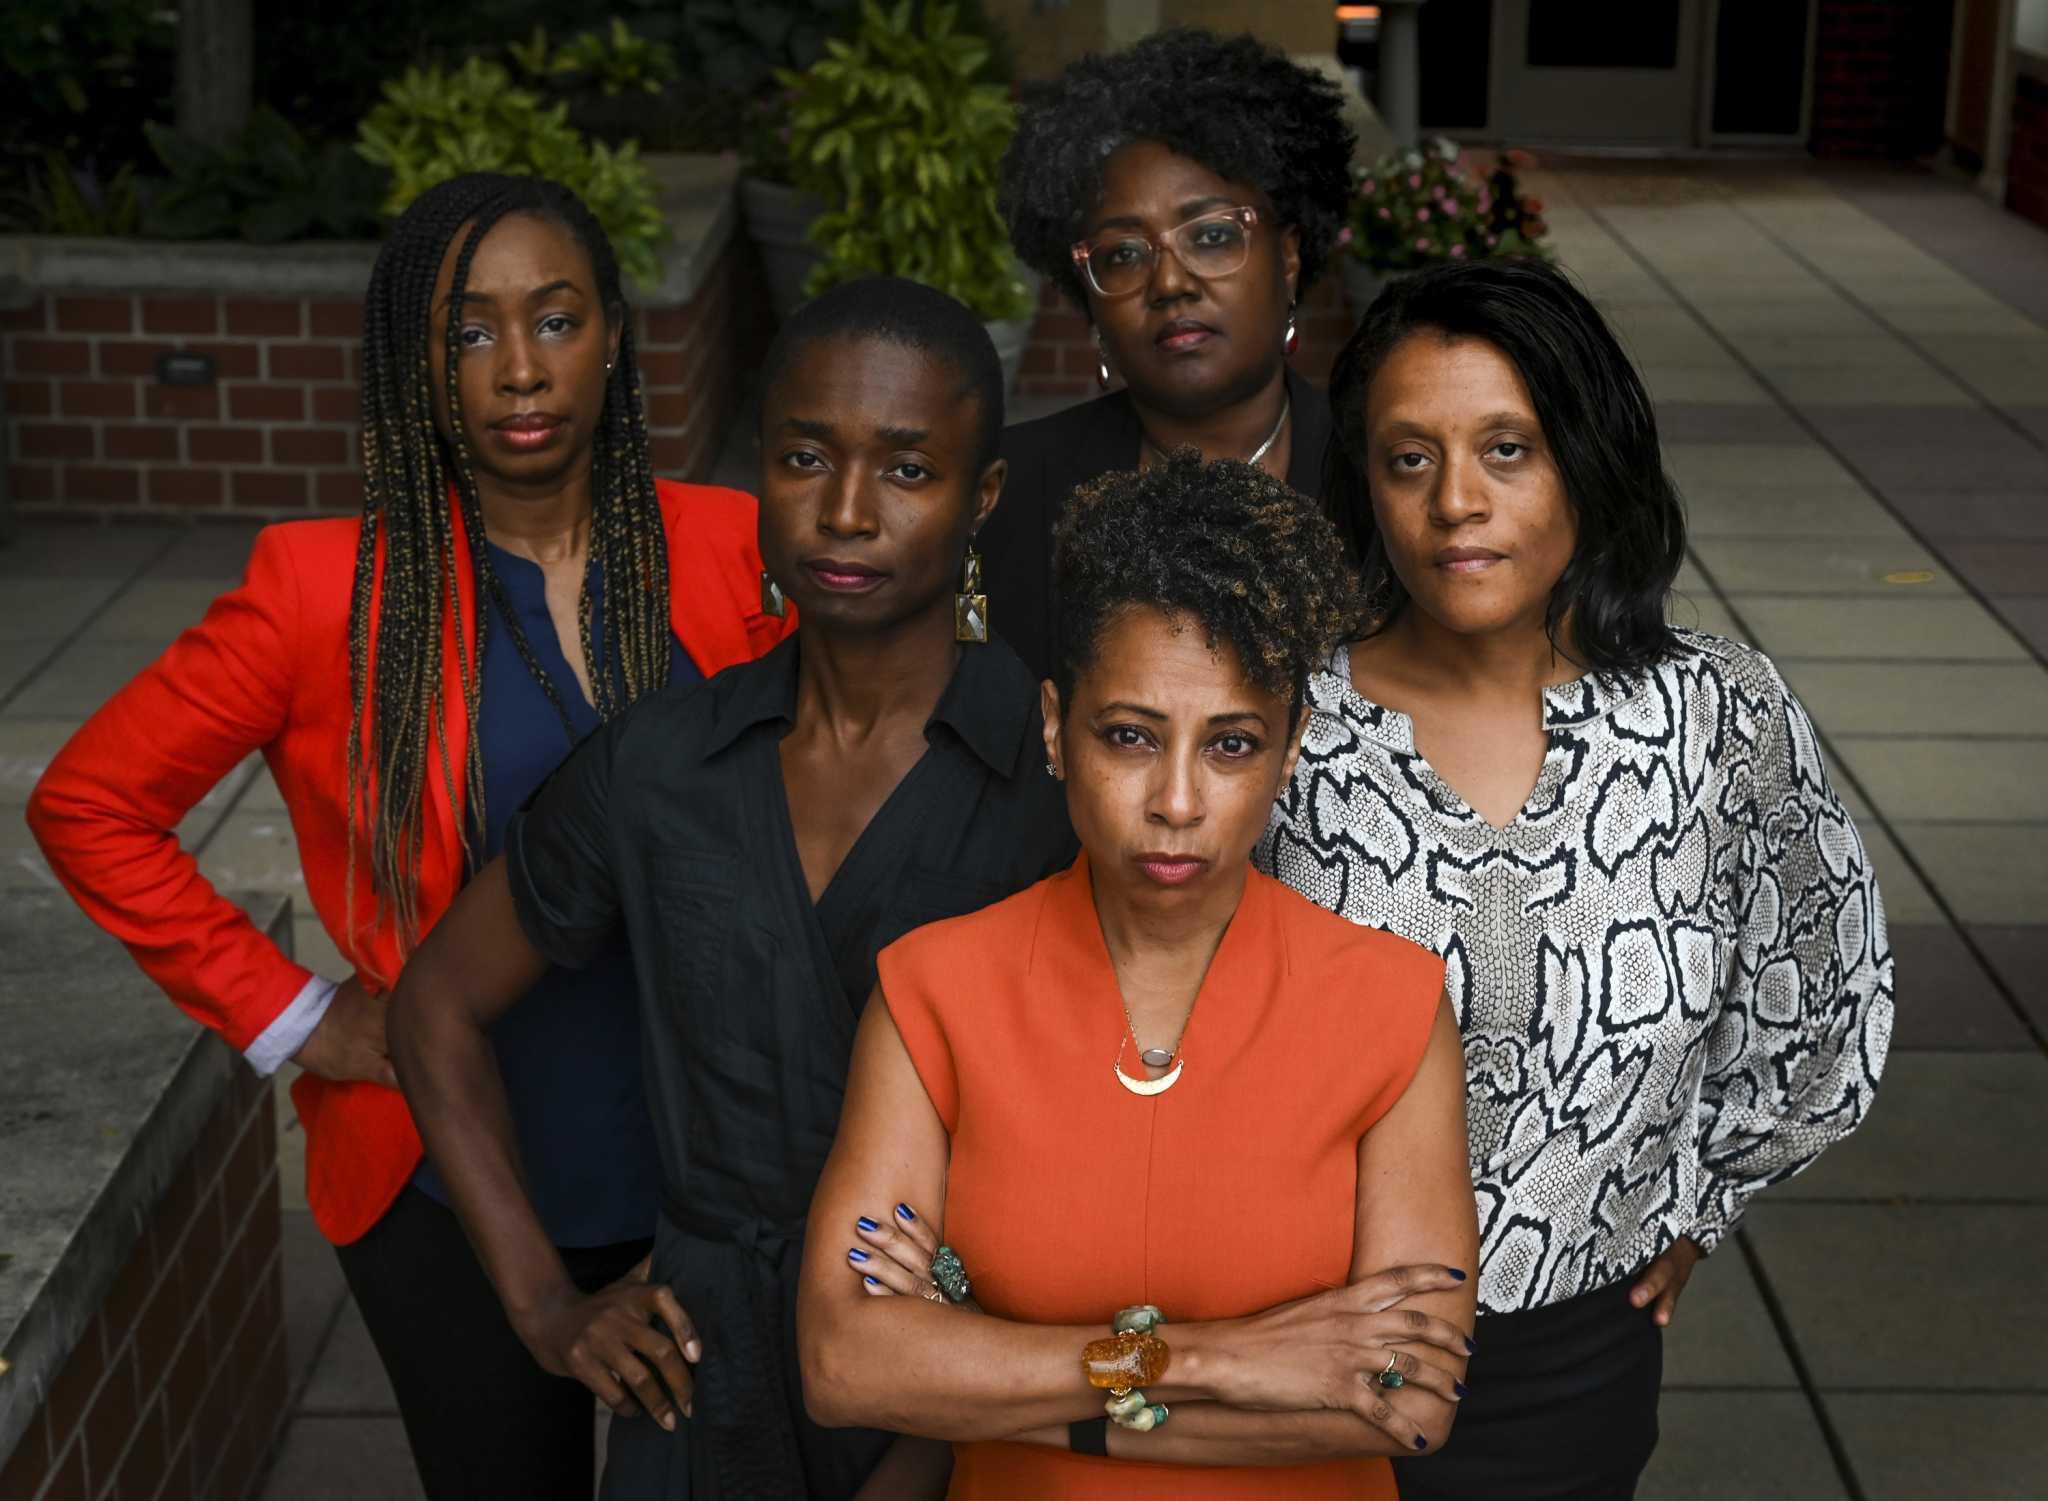 Arlington schools were named best in Virginia, but black parents disrupt that idea